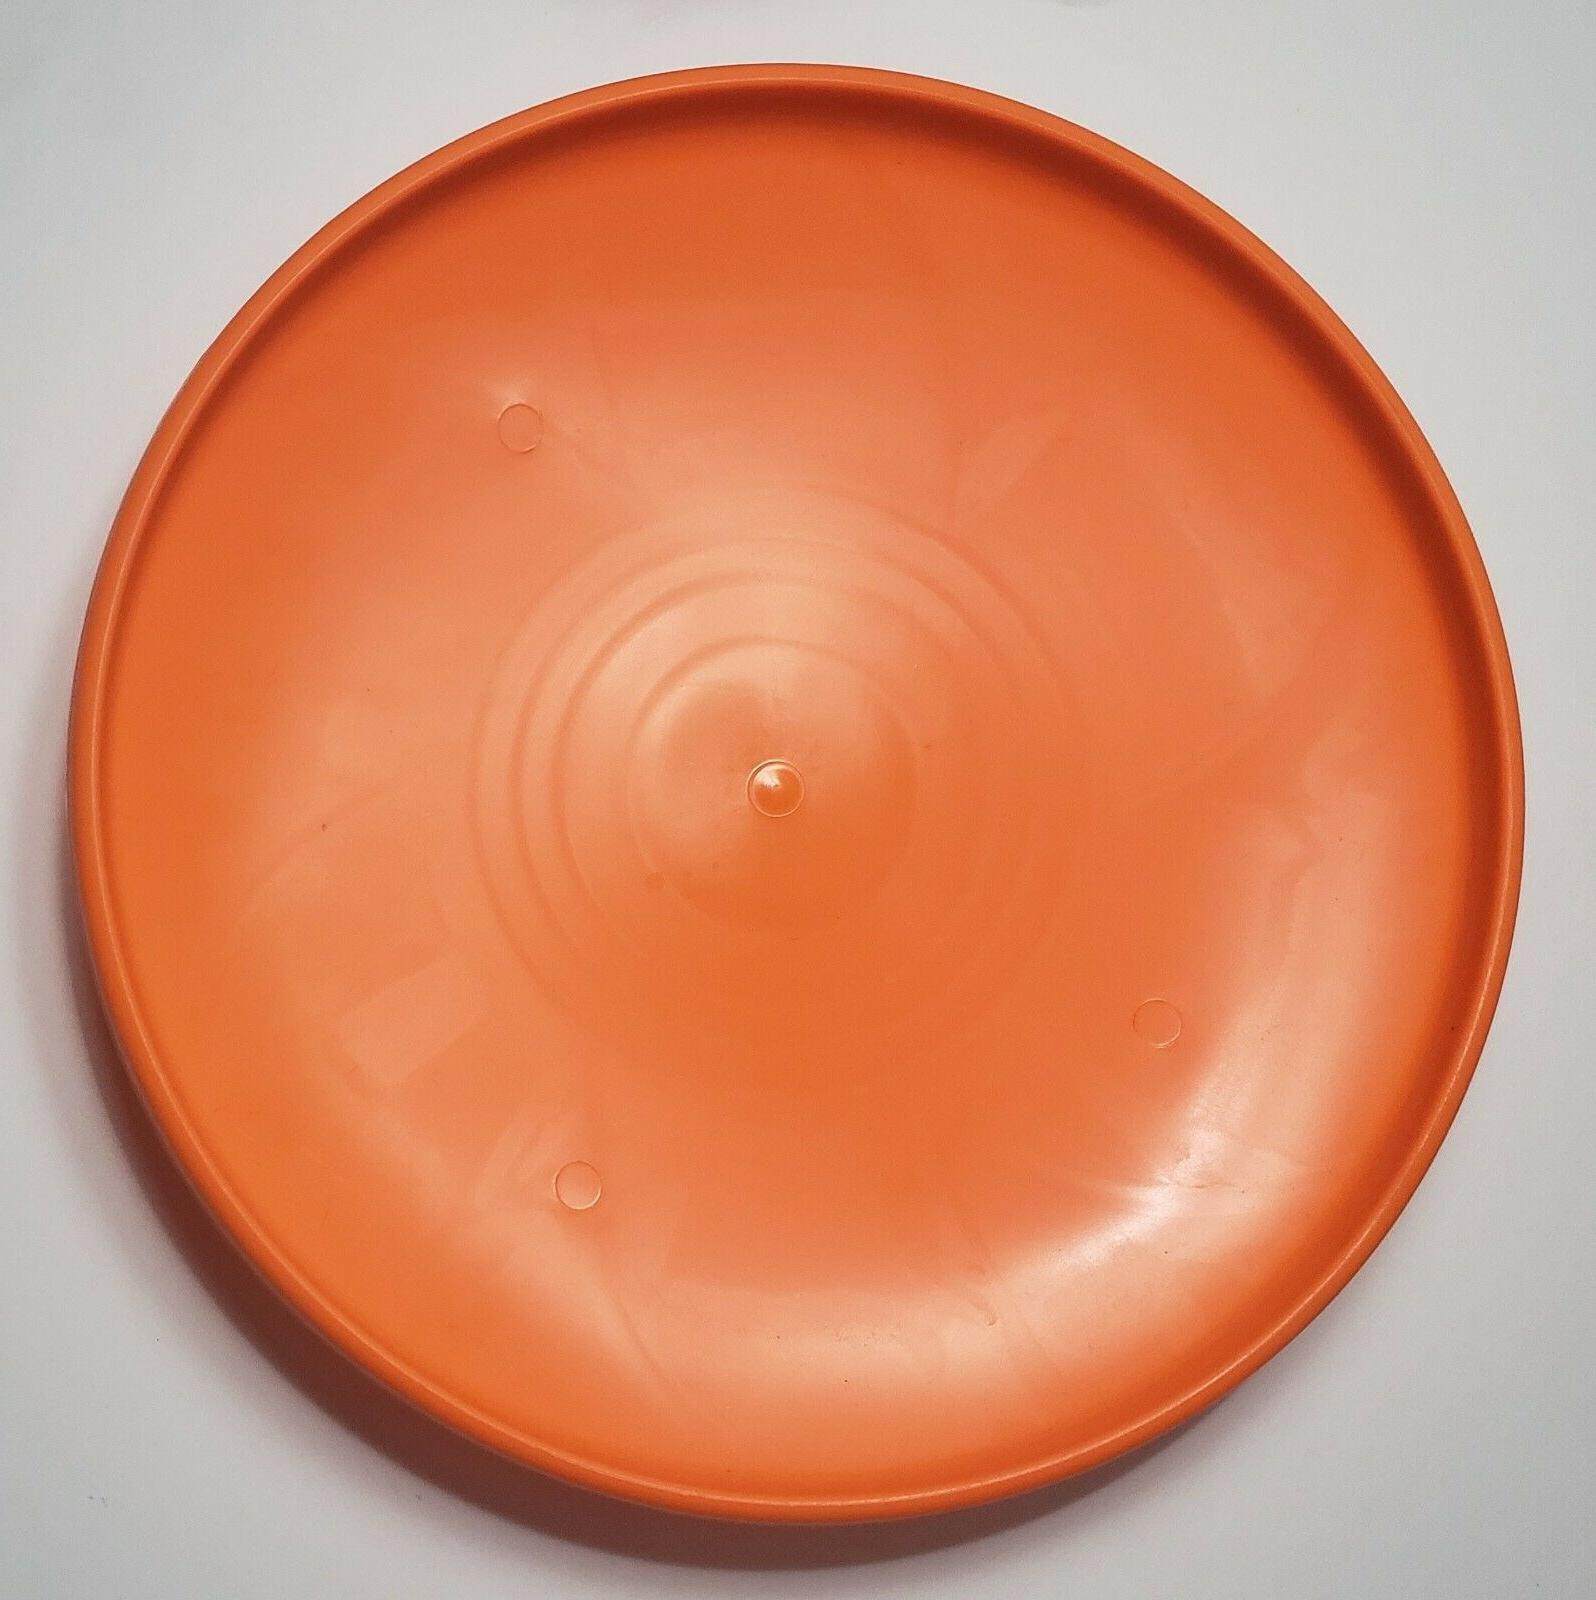 Heavy Duty Plastic Frisbee